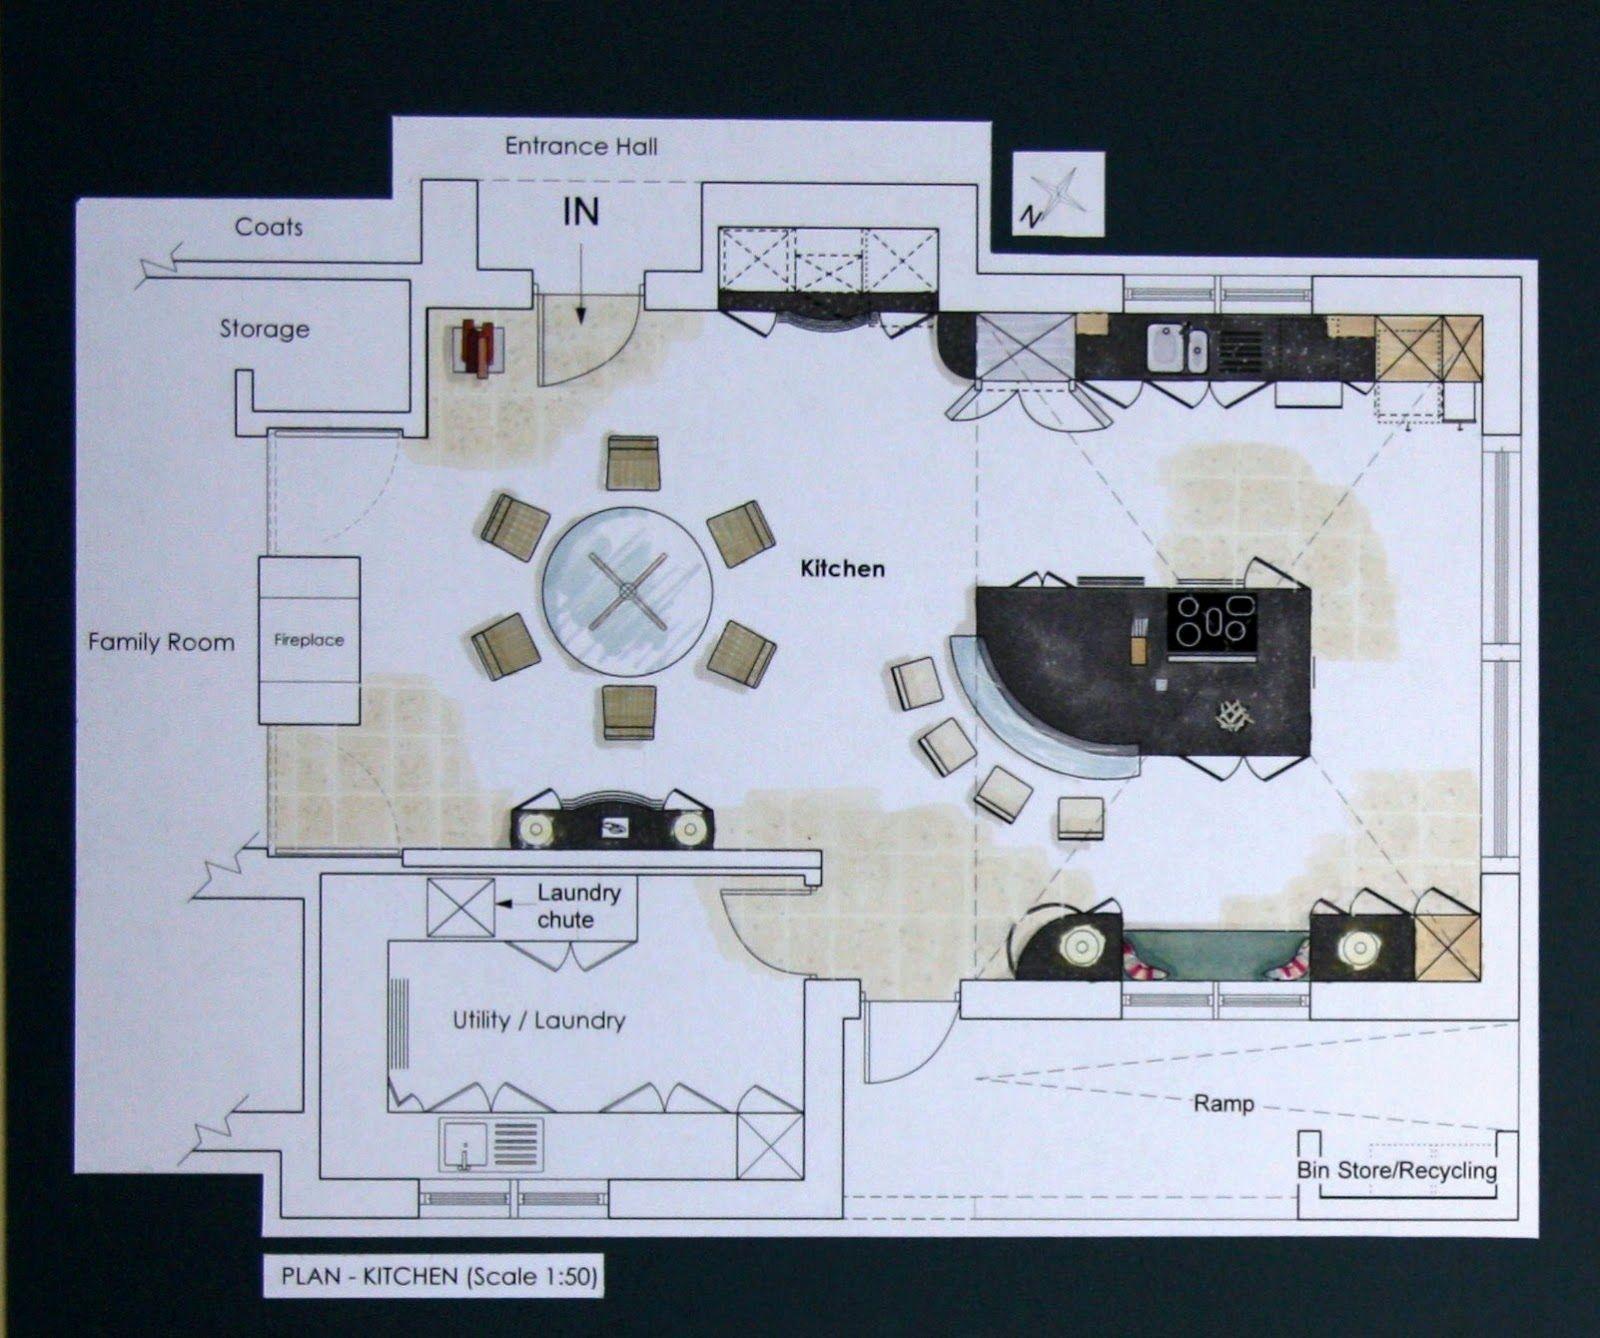 sensational small bathroom plans picture-Superb Small Bathroom Plans Plan